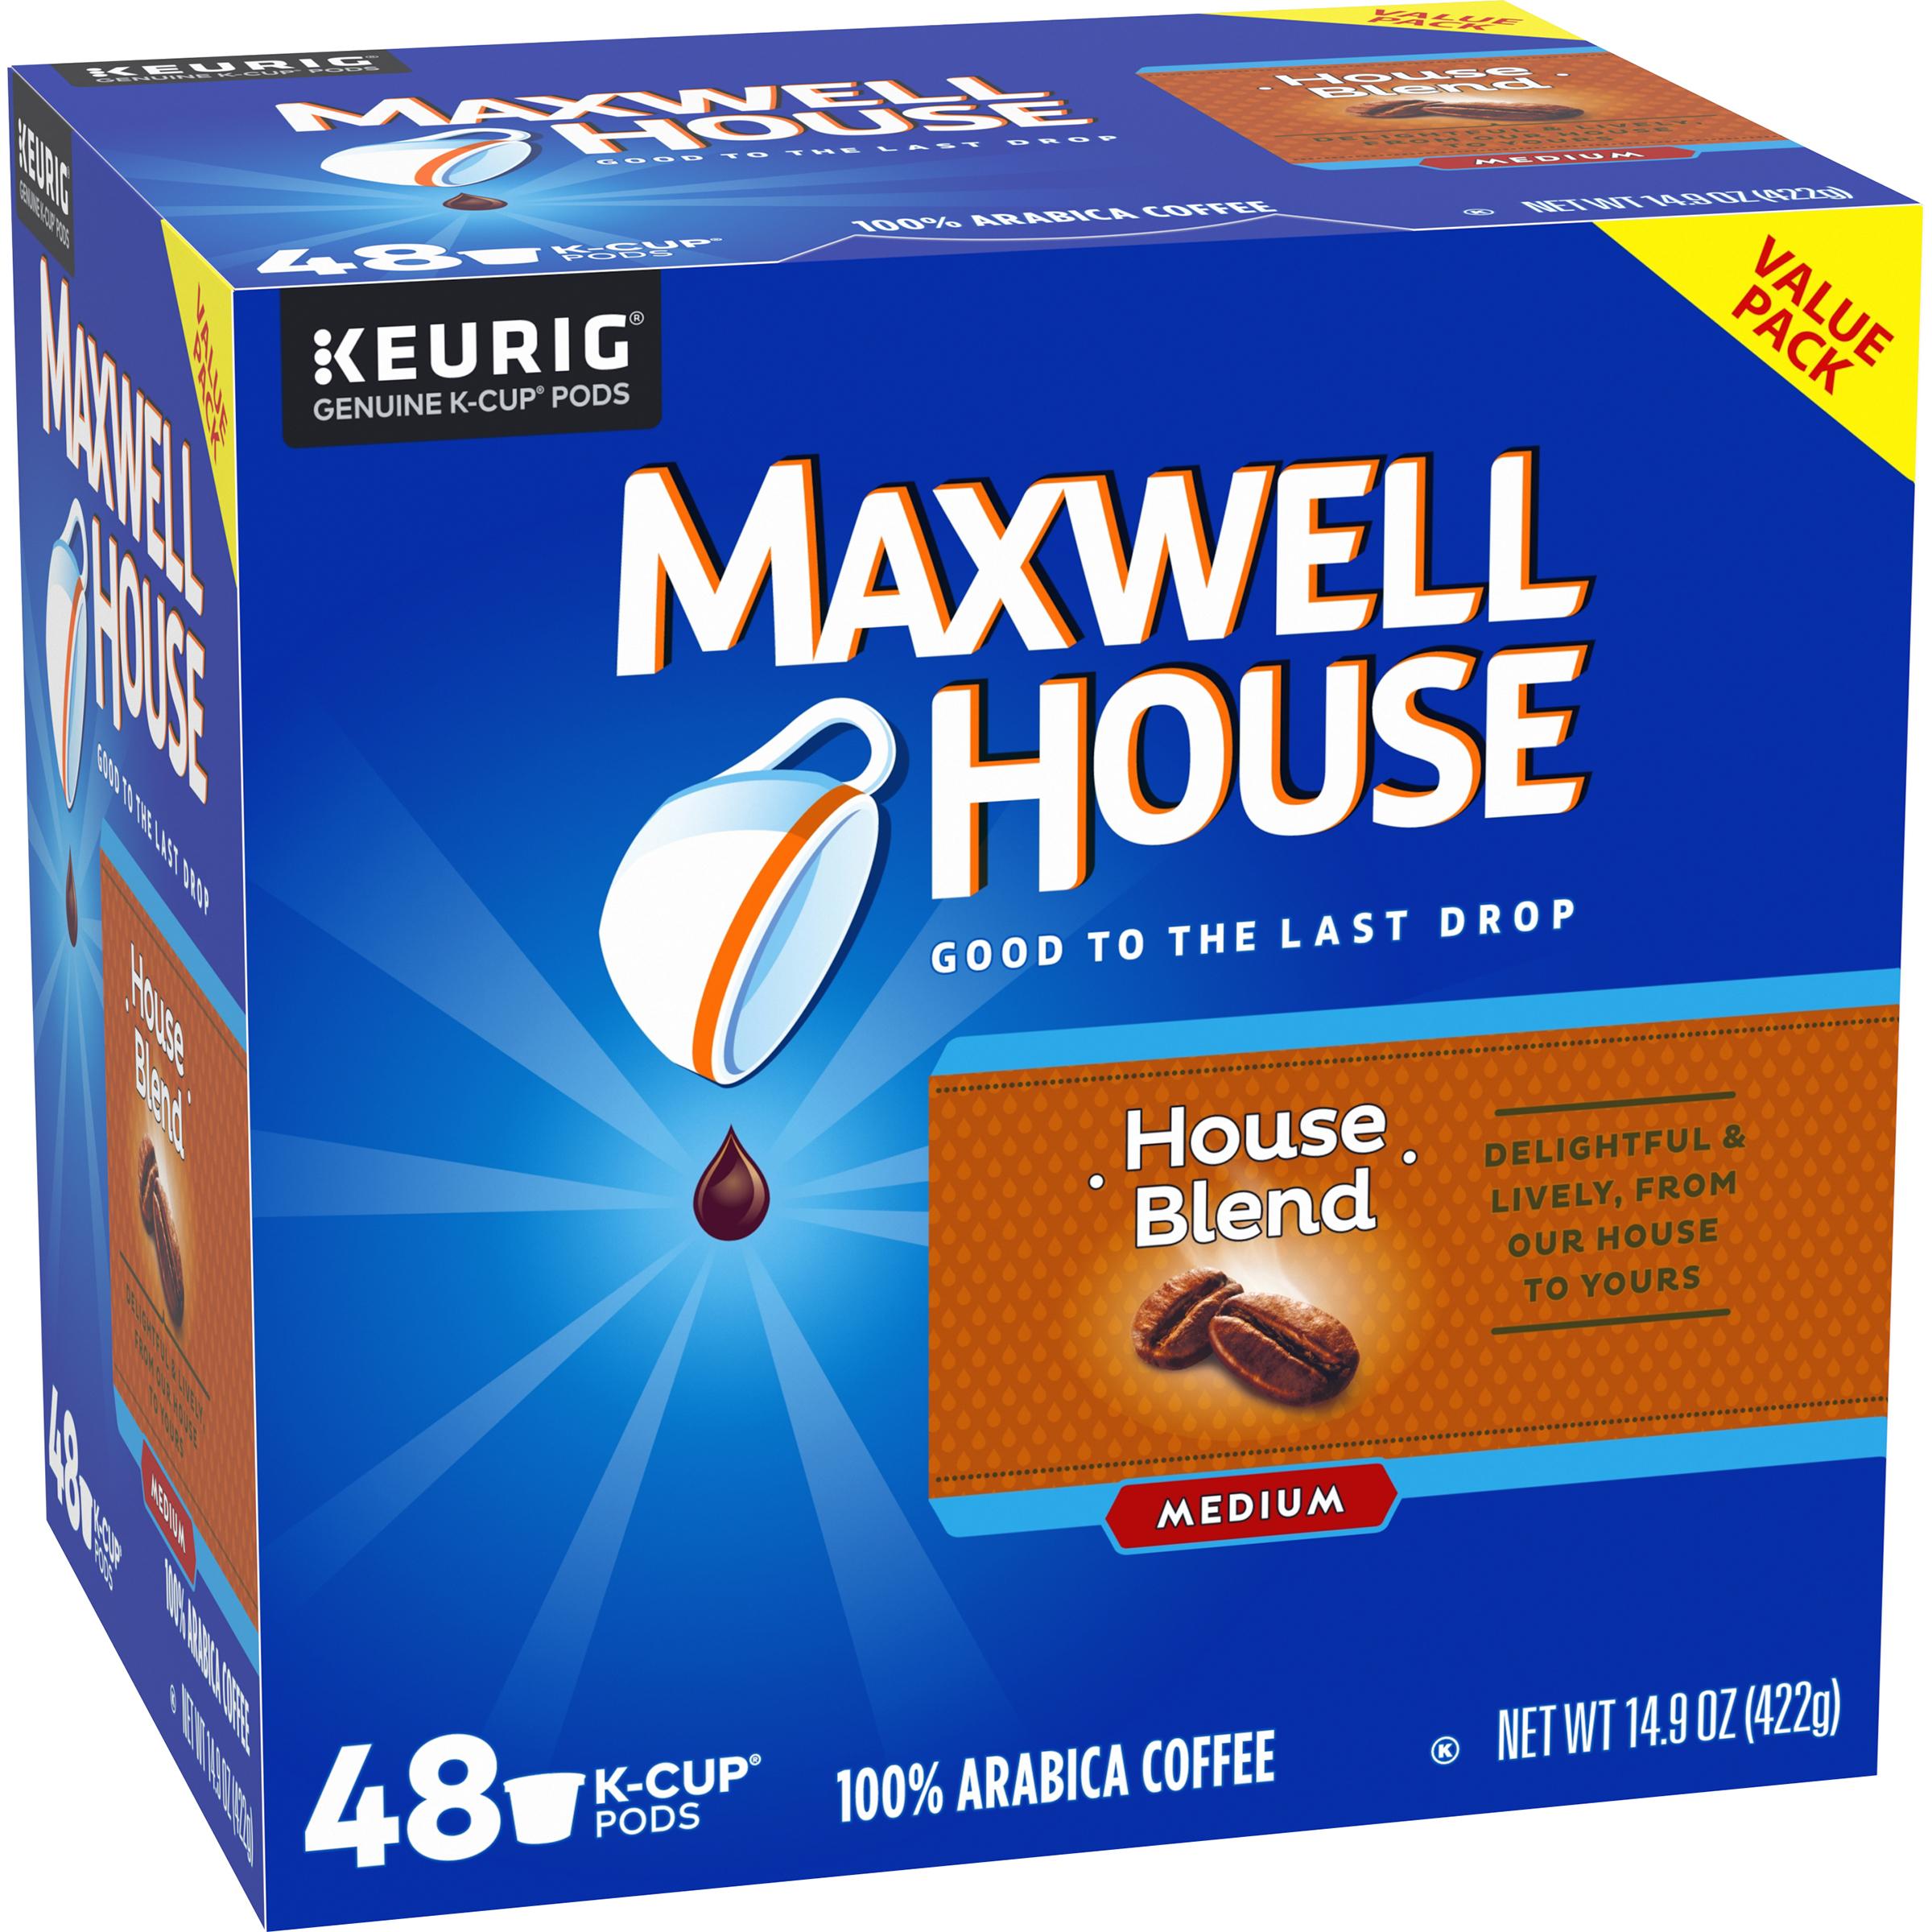 Maxwell House 48 ct. House Blend K-Cups $8.55 @ Walmart B&M, YMMV